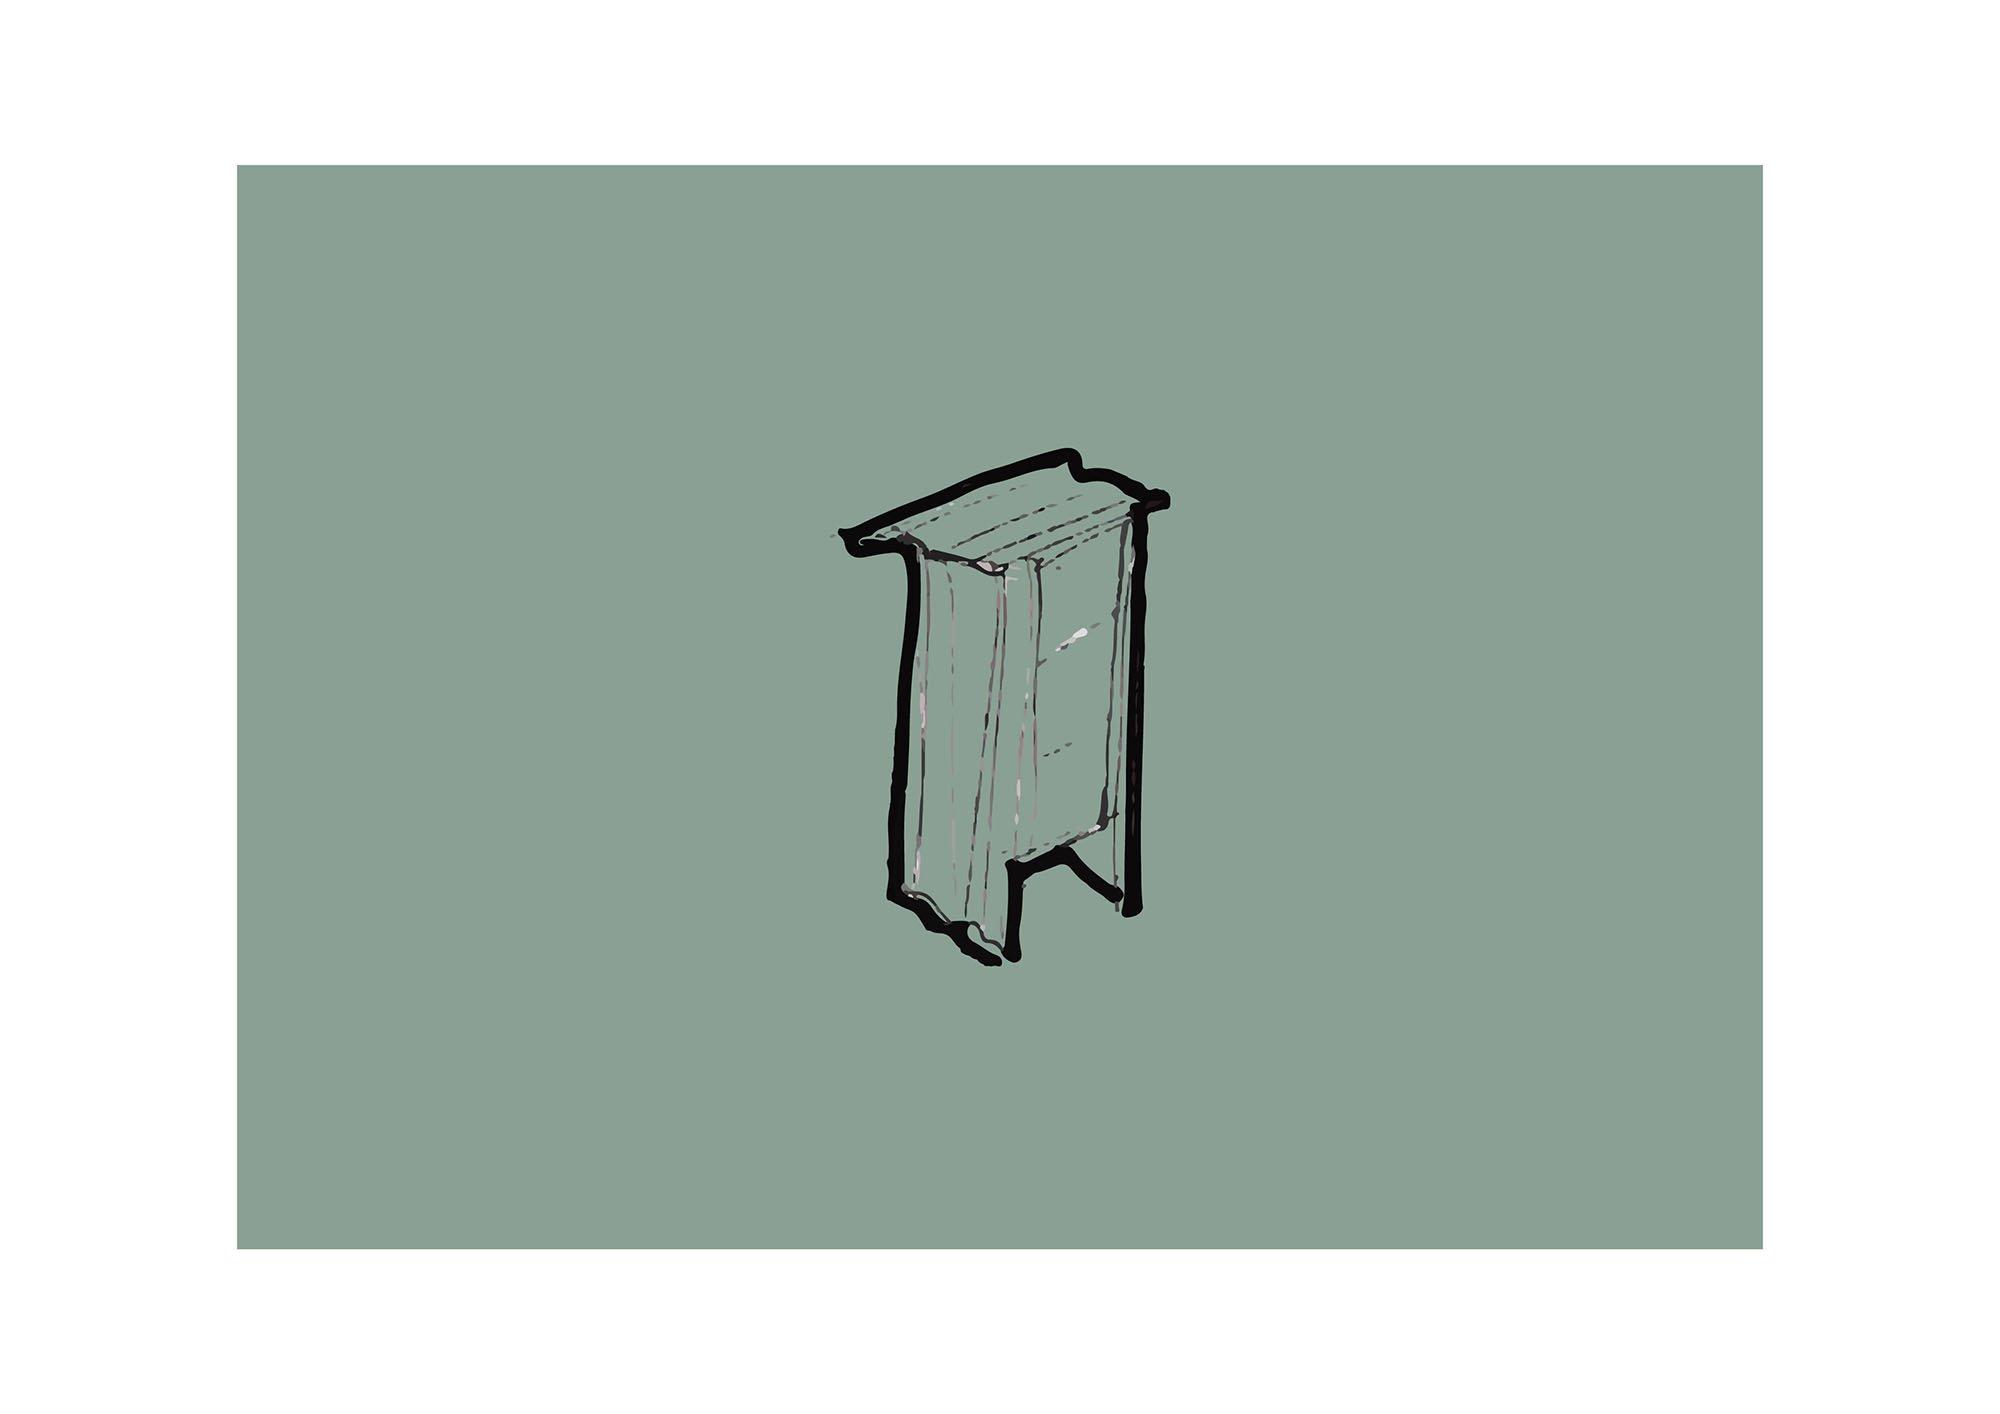 Tan Wei Xiang_Recollect_Sketches 1